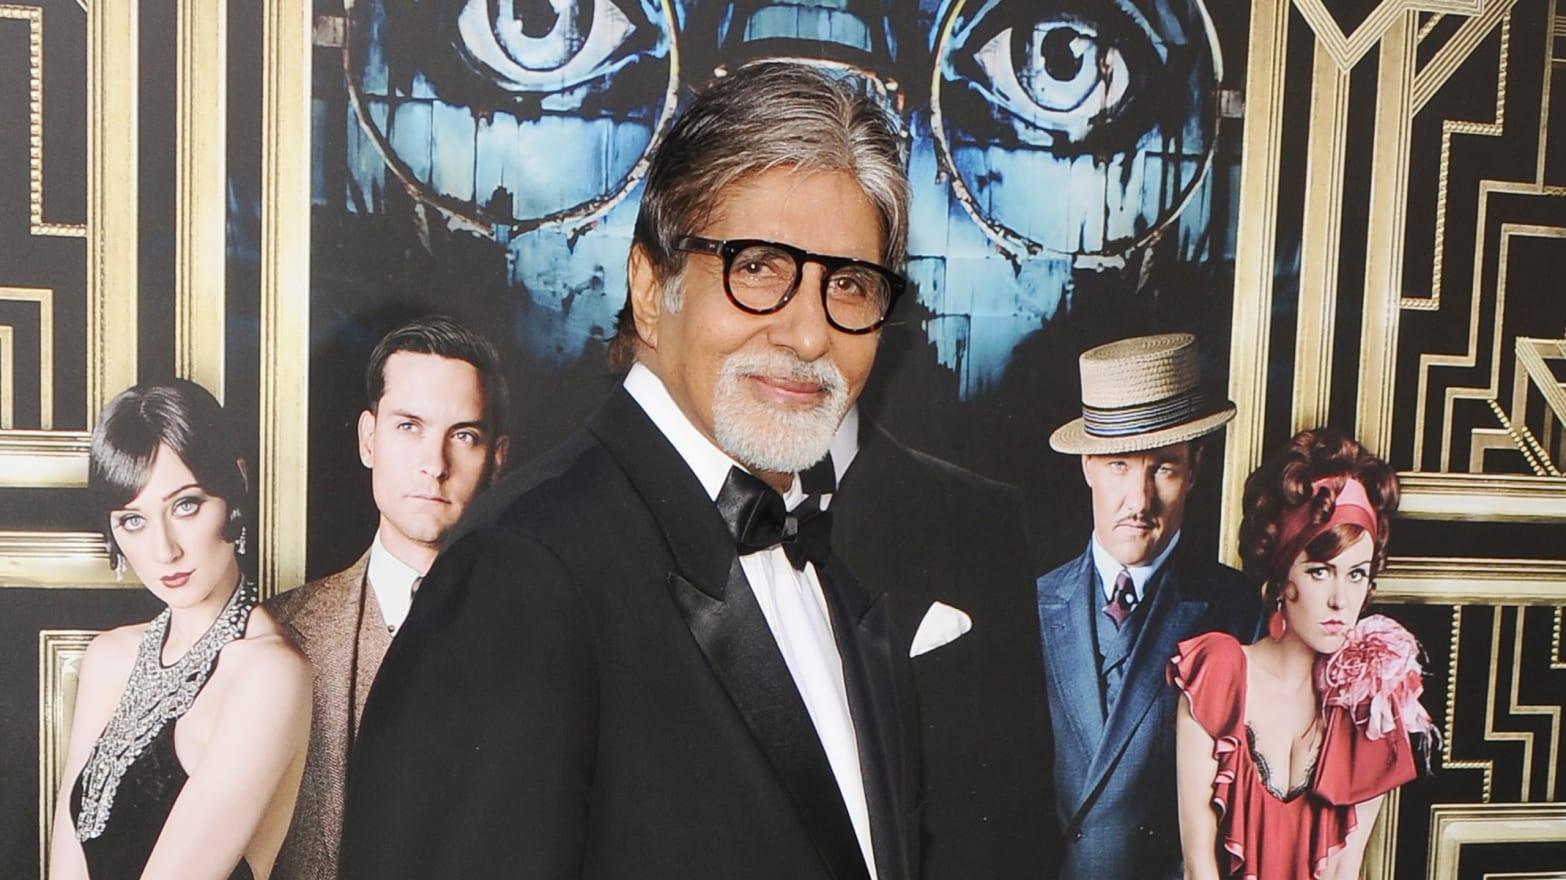 975167a6e0427 Amitabh Bachchan Is  The Great Gatsby s Bollywood Friend